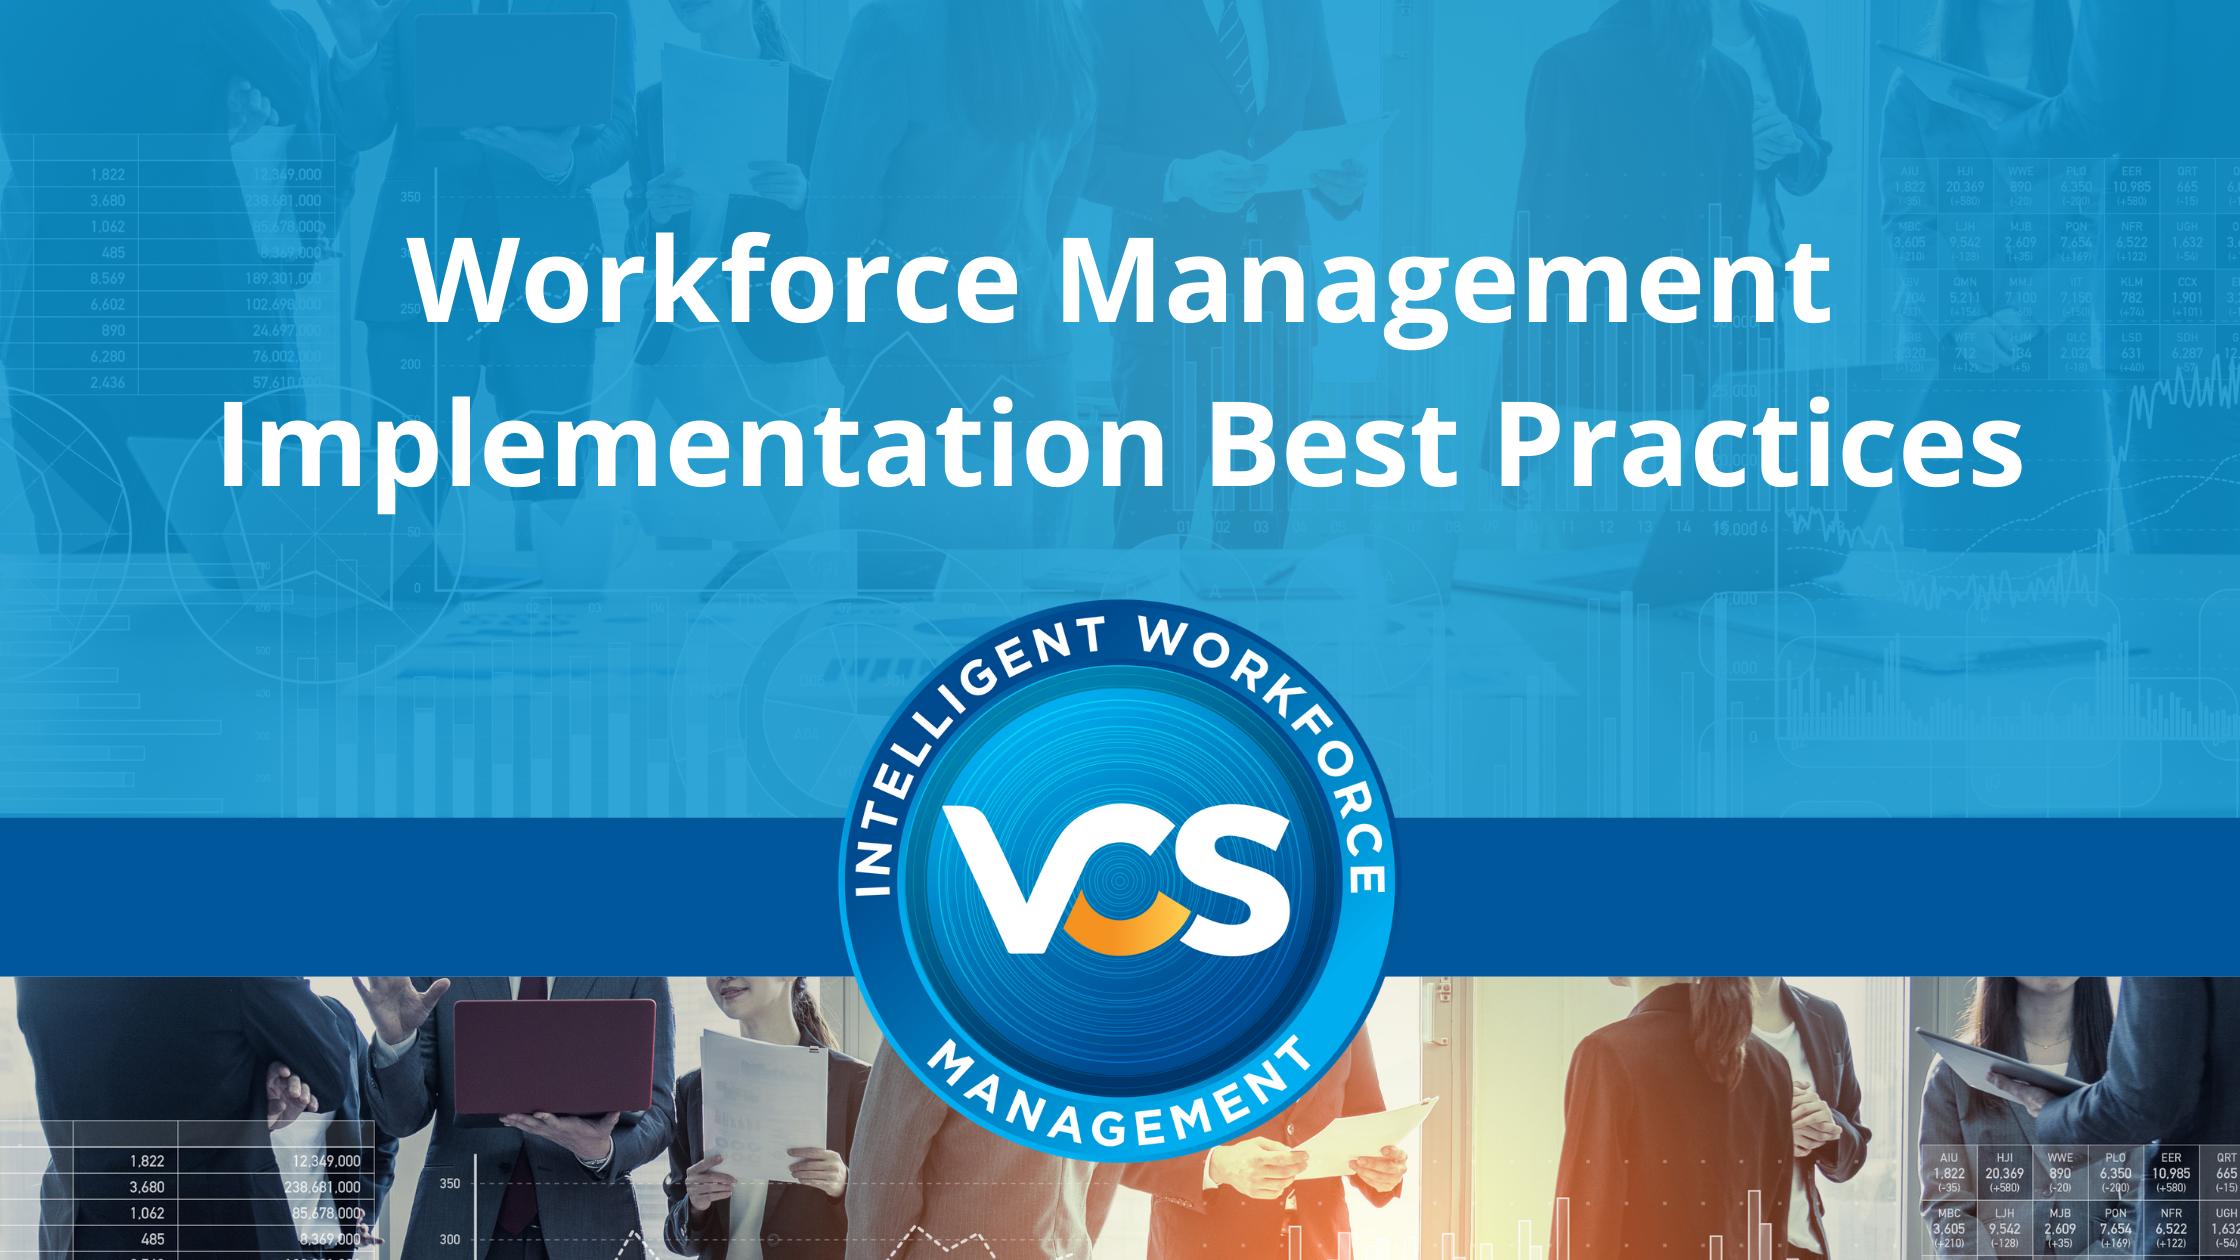 Workforce Management Implementation Best Practices